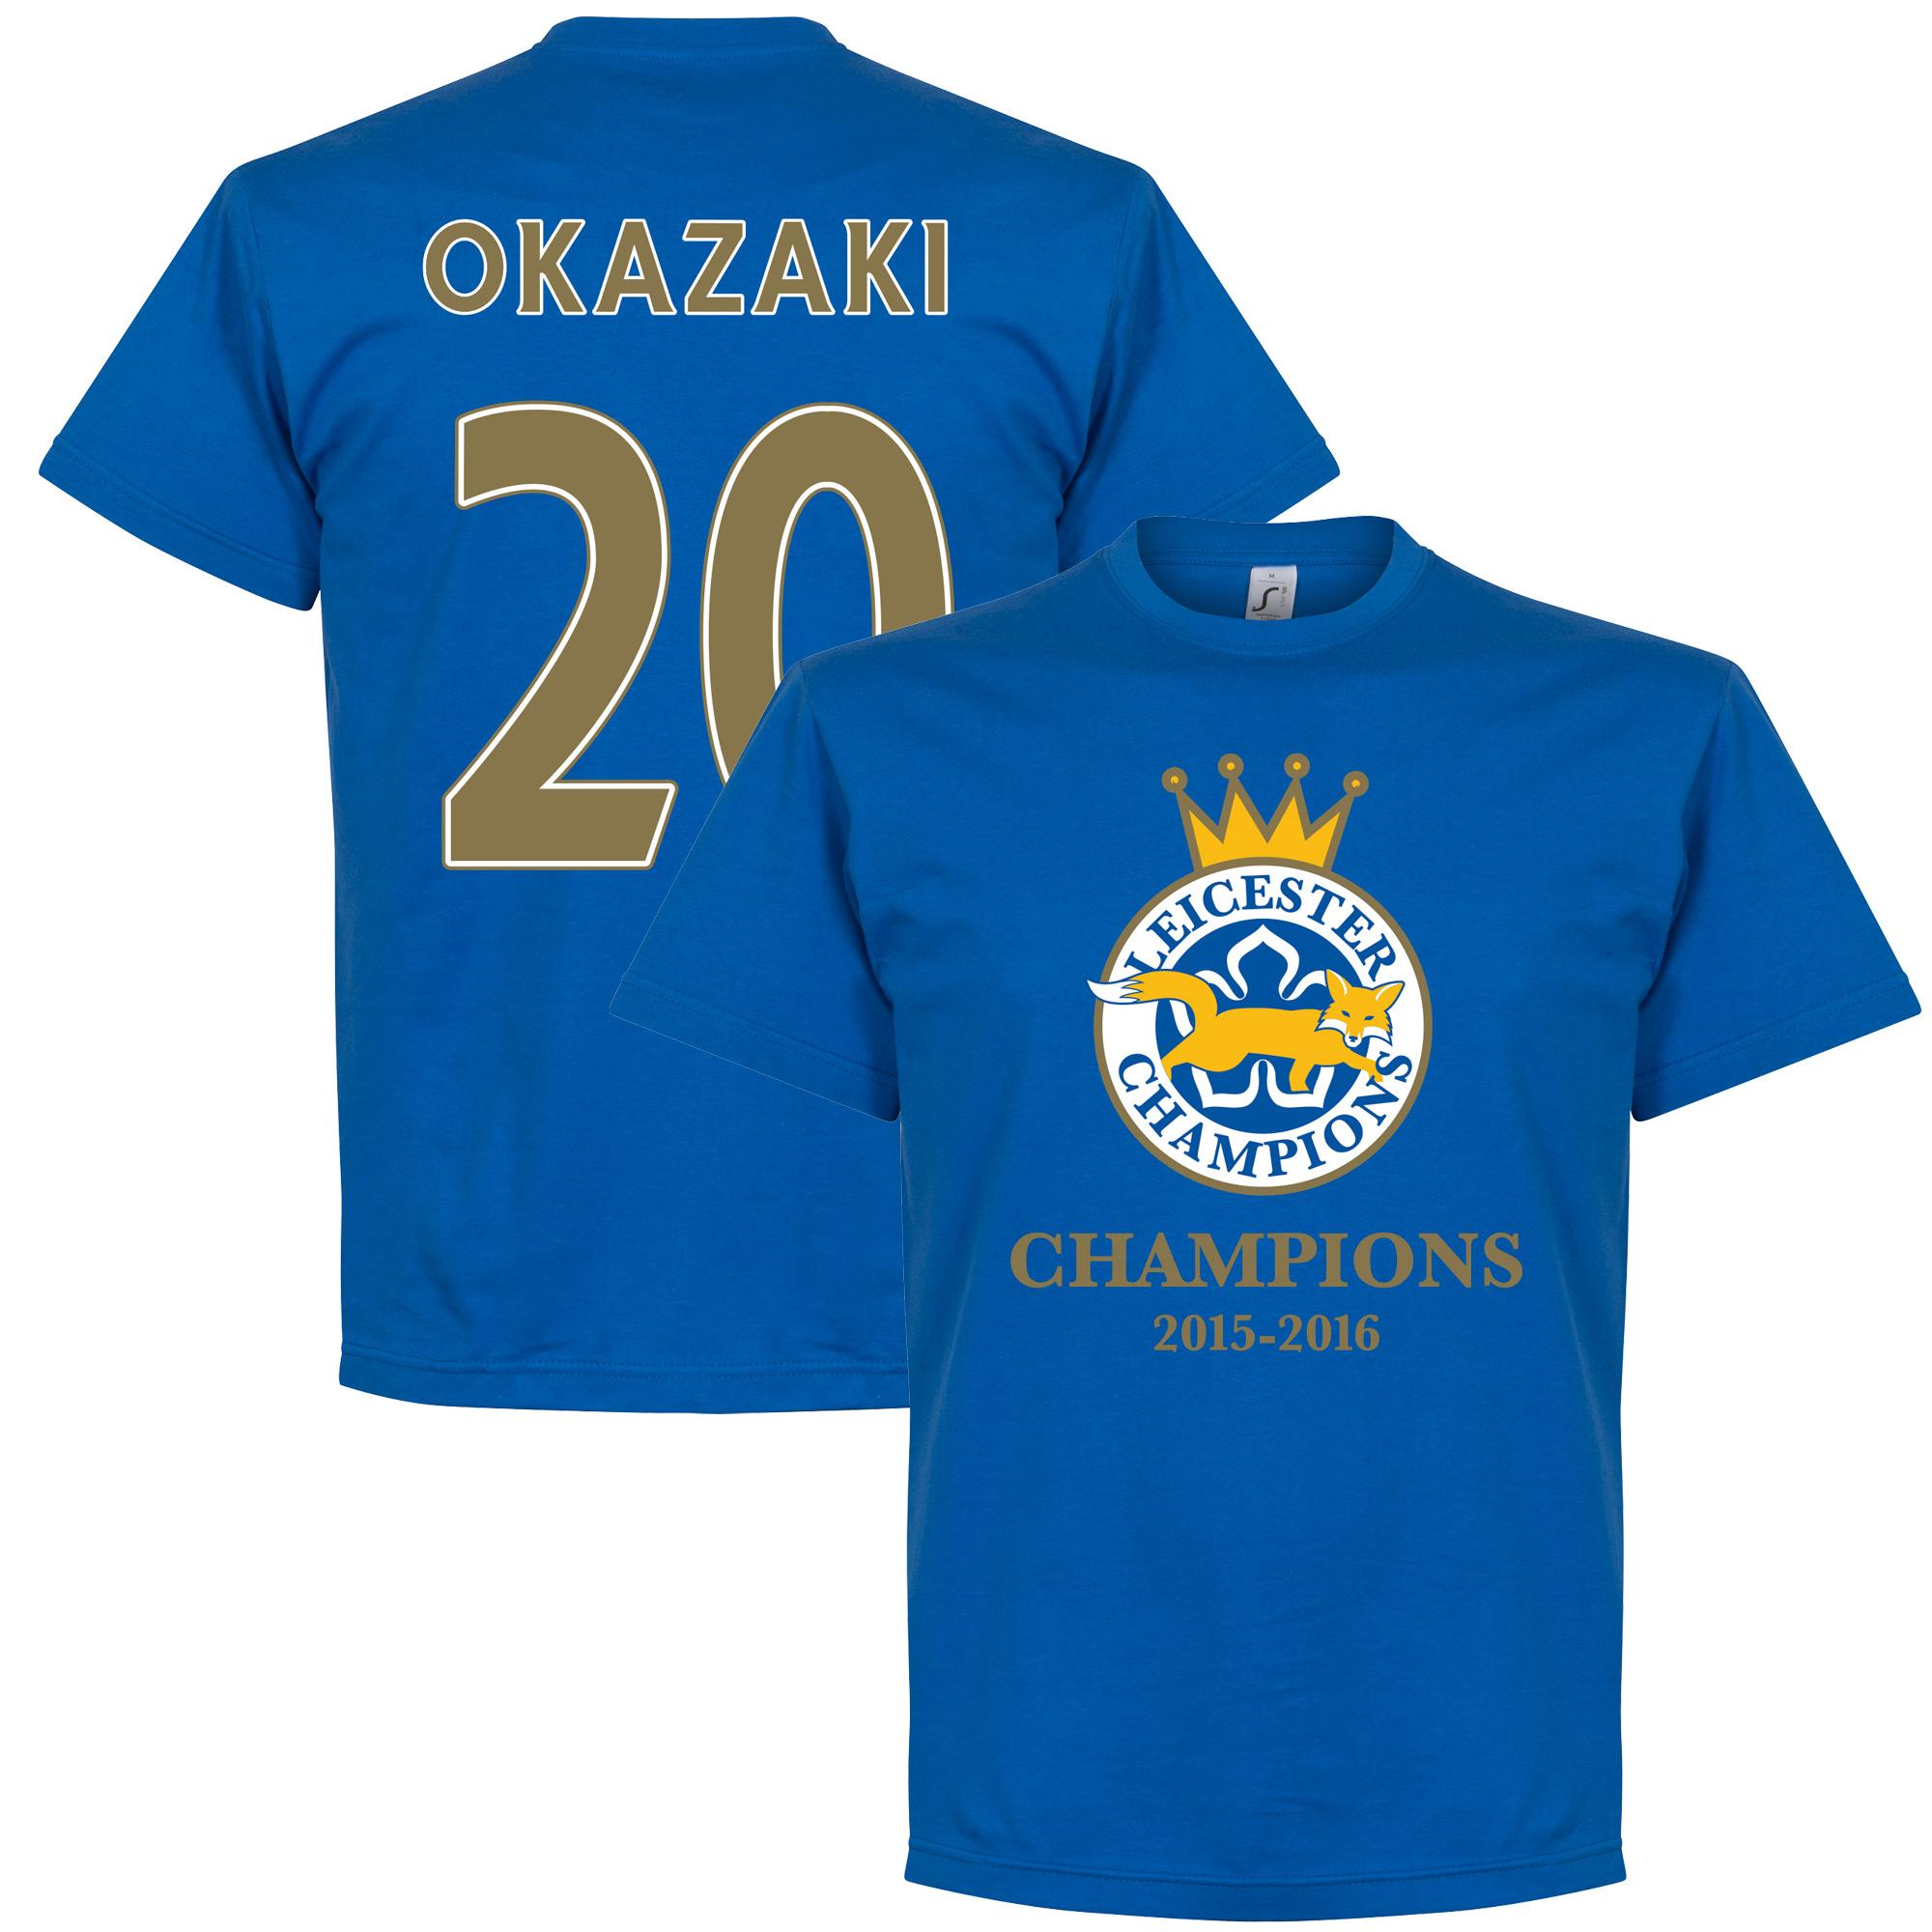 Leicester Champions Okazaki Tee - Royal - L